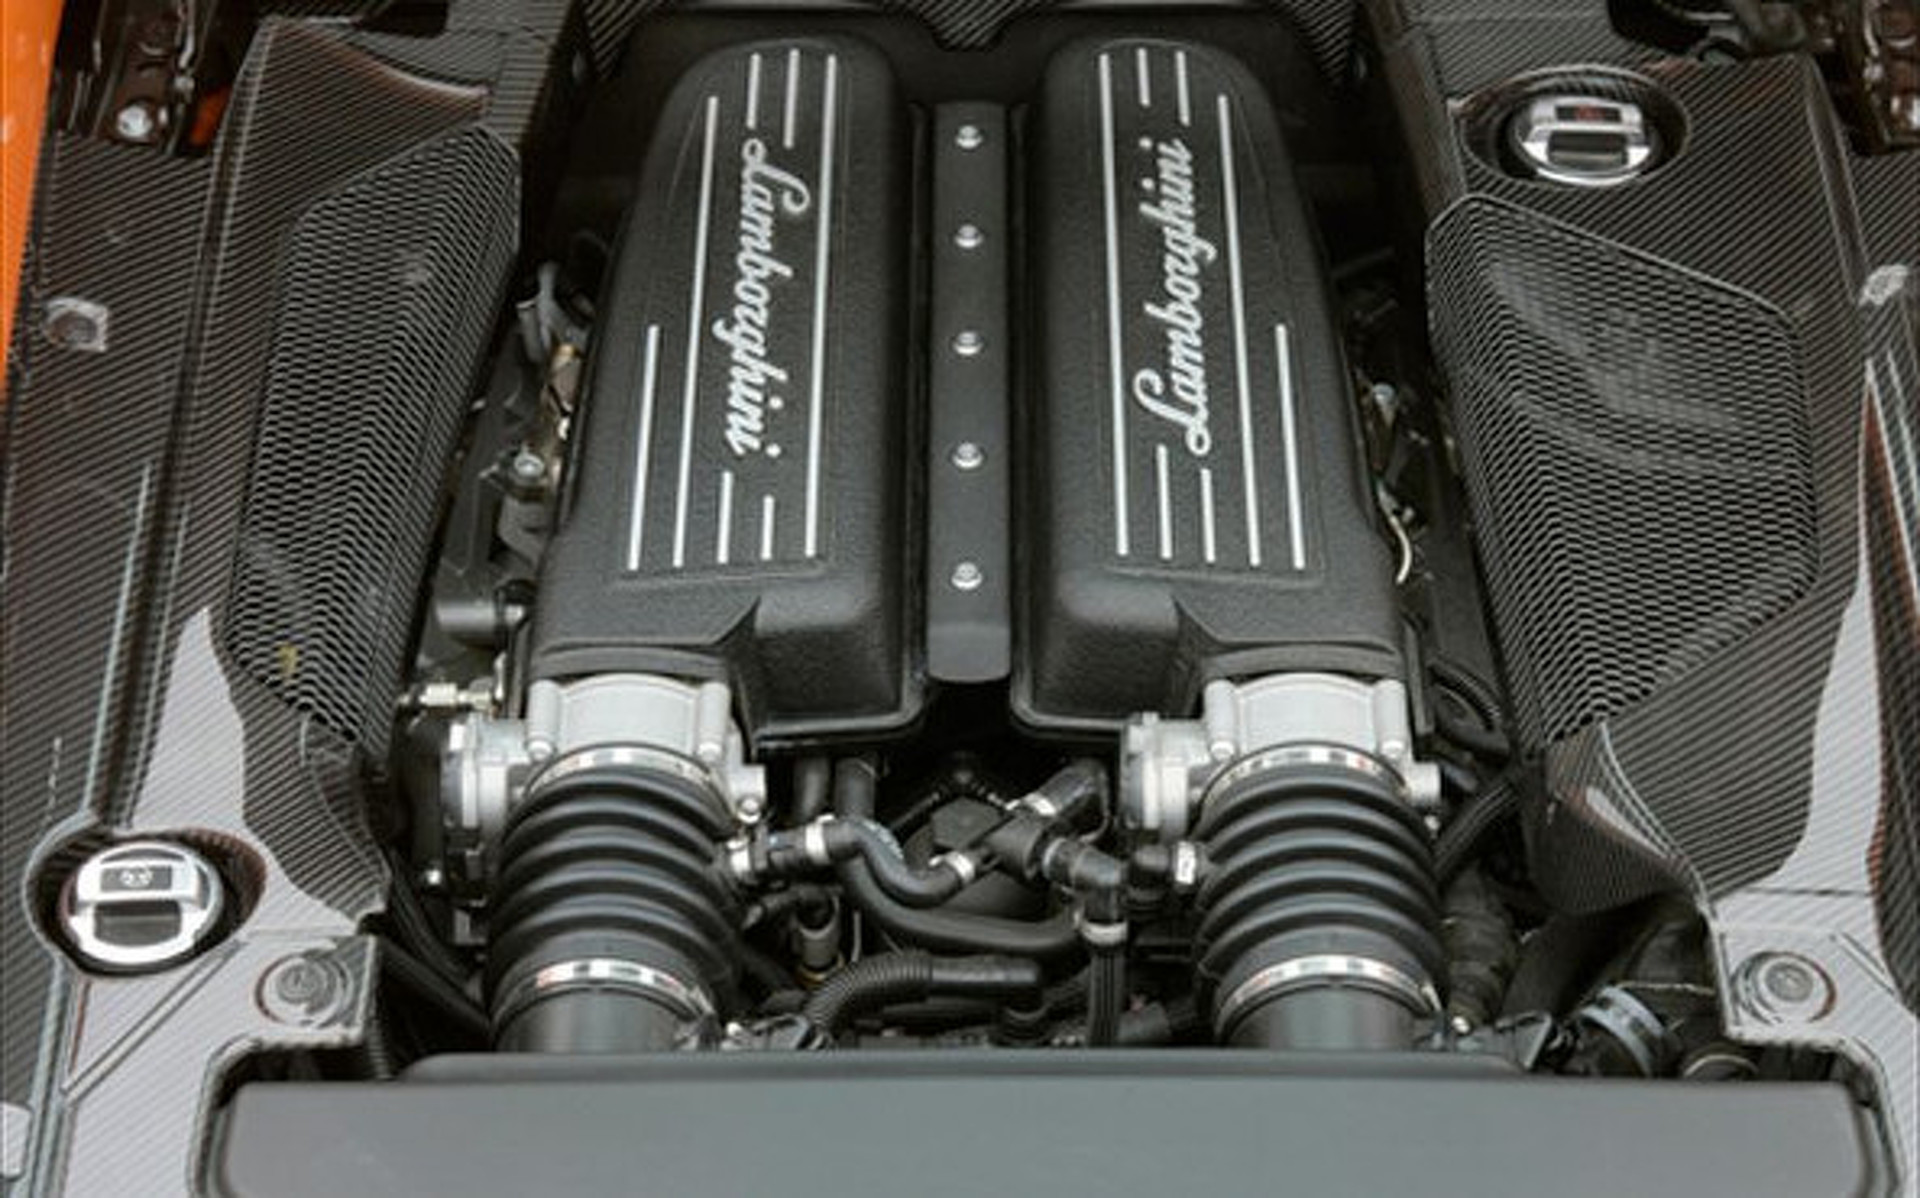 ten-things-you-need-to-know-about-the-lamborghini-huracan Breathtaking Price Of Lamborghini Huracán Lp 610 4 Cars Trend